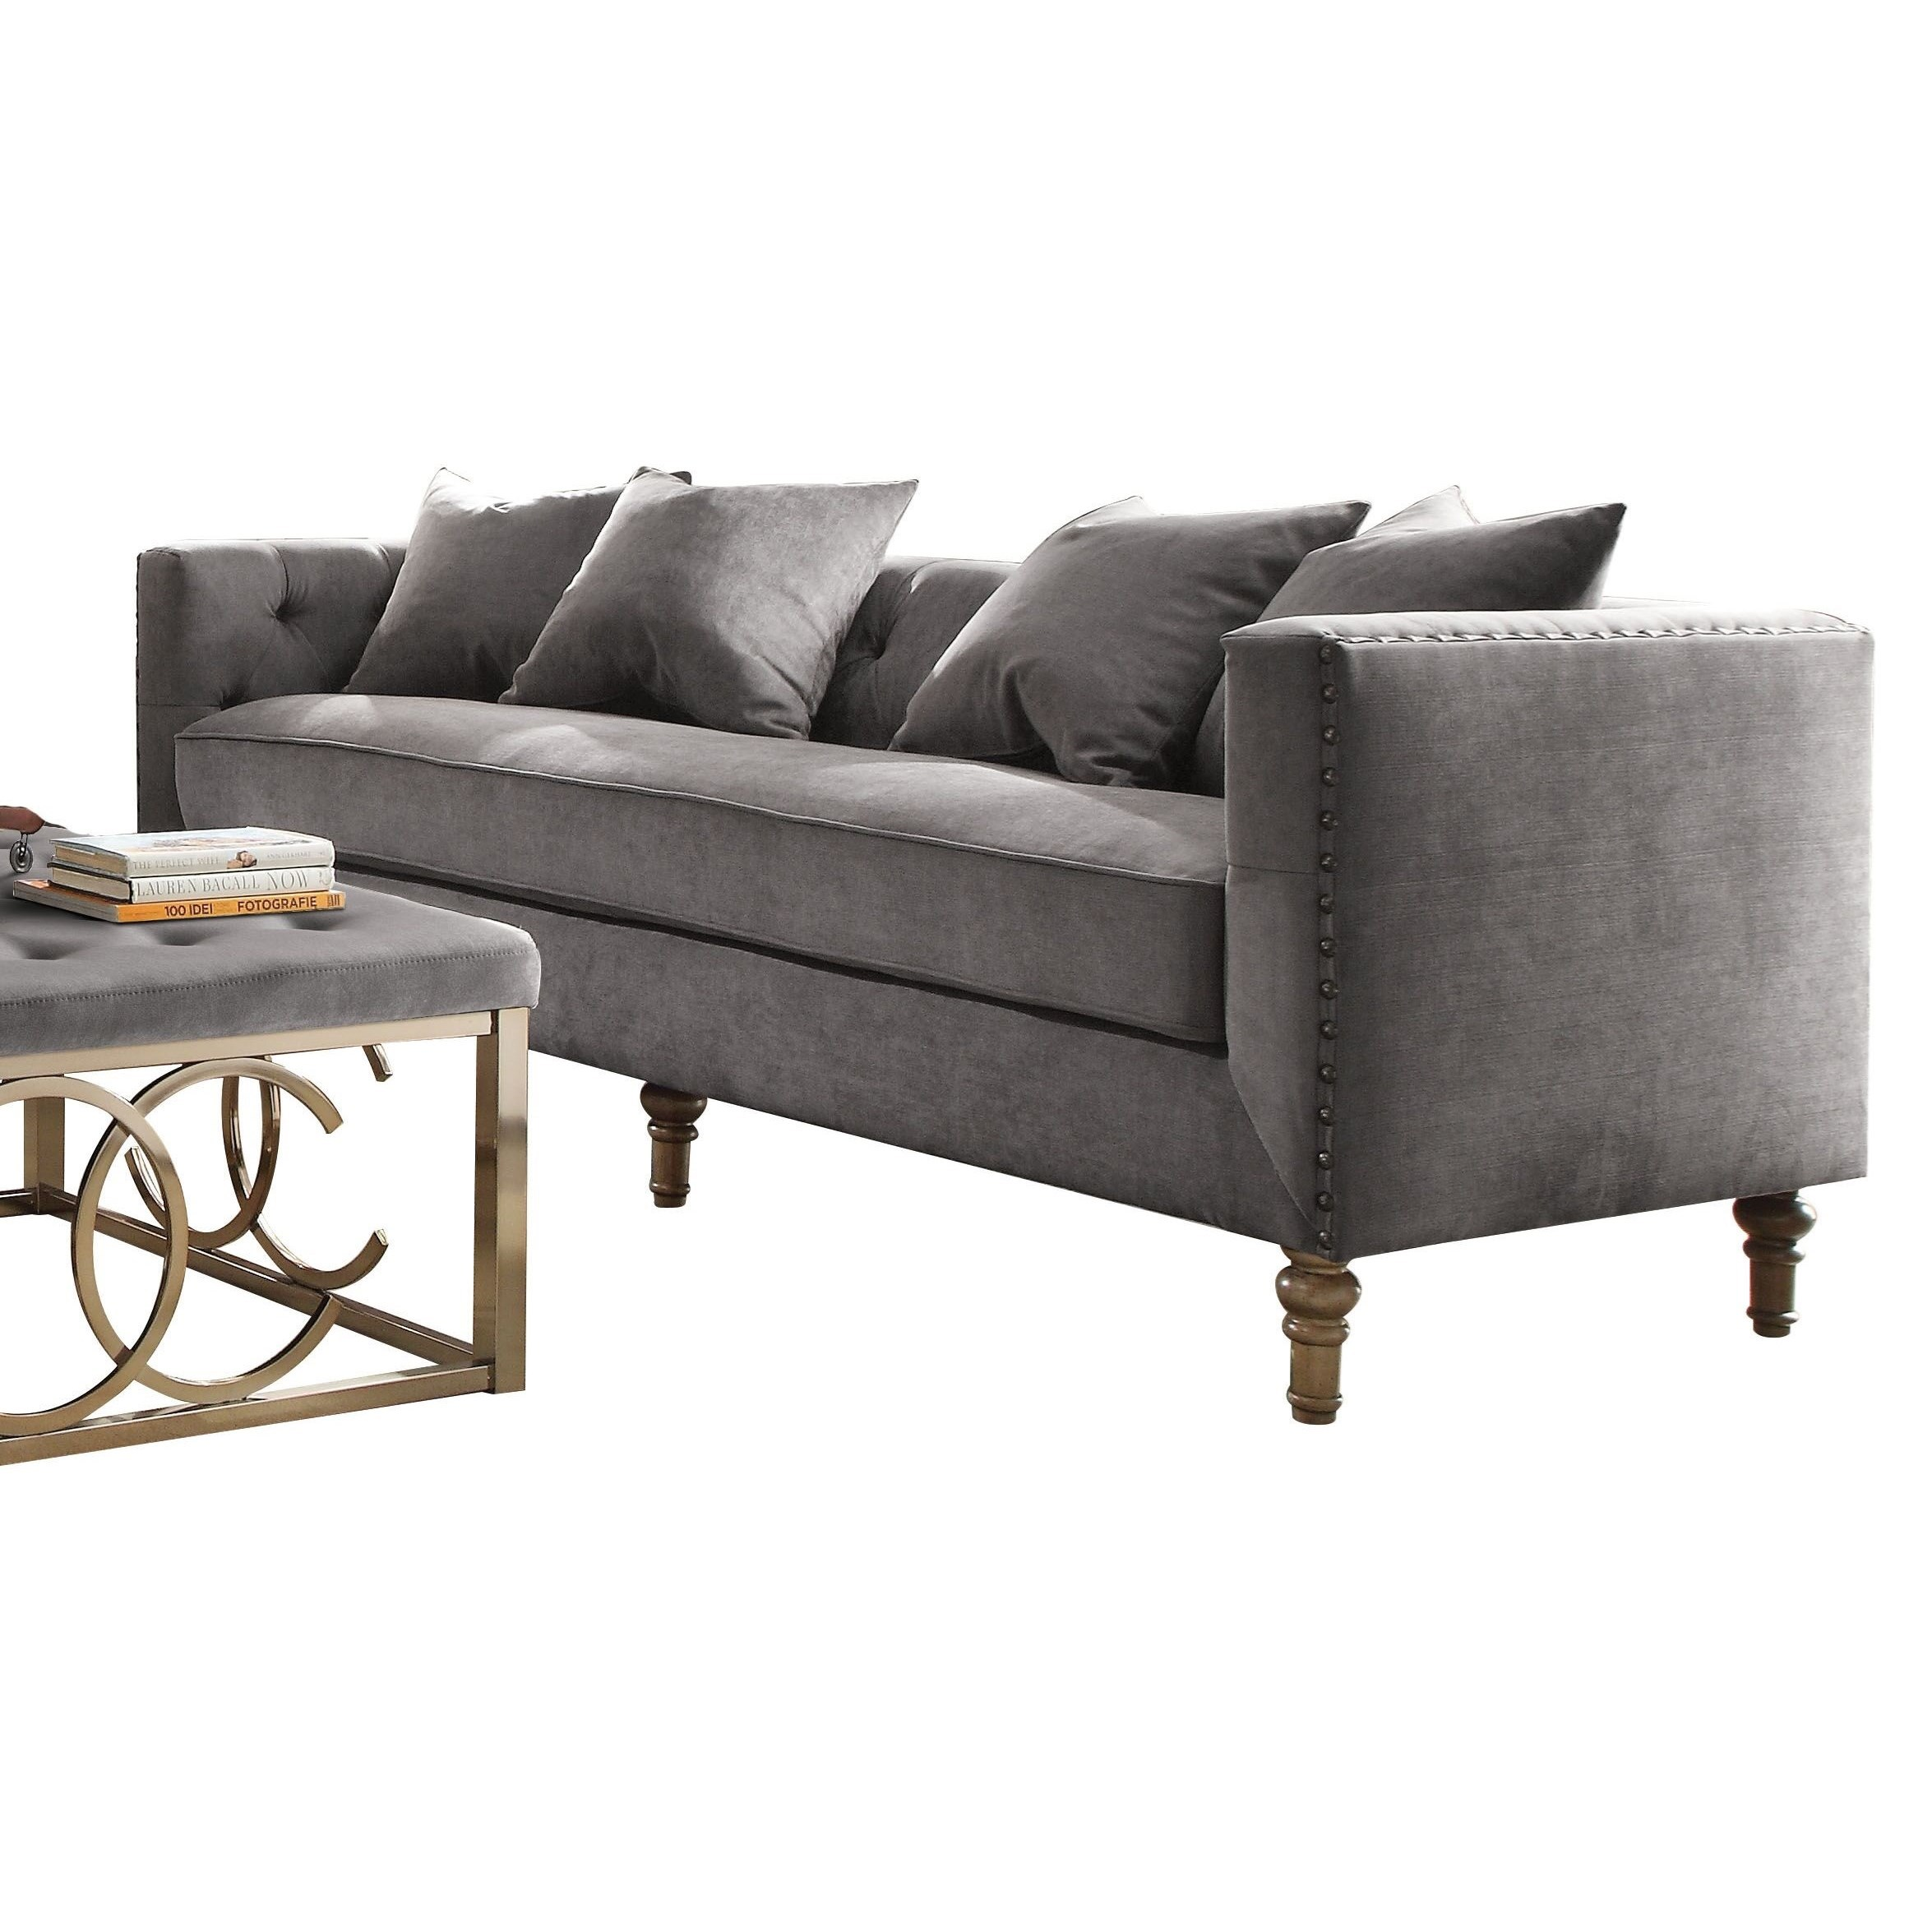 Sidonia Sofa with 4 Pillows by Acme Furniture at Carolina Direct